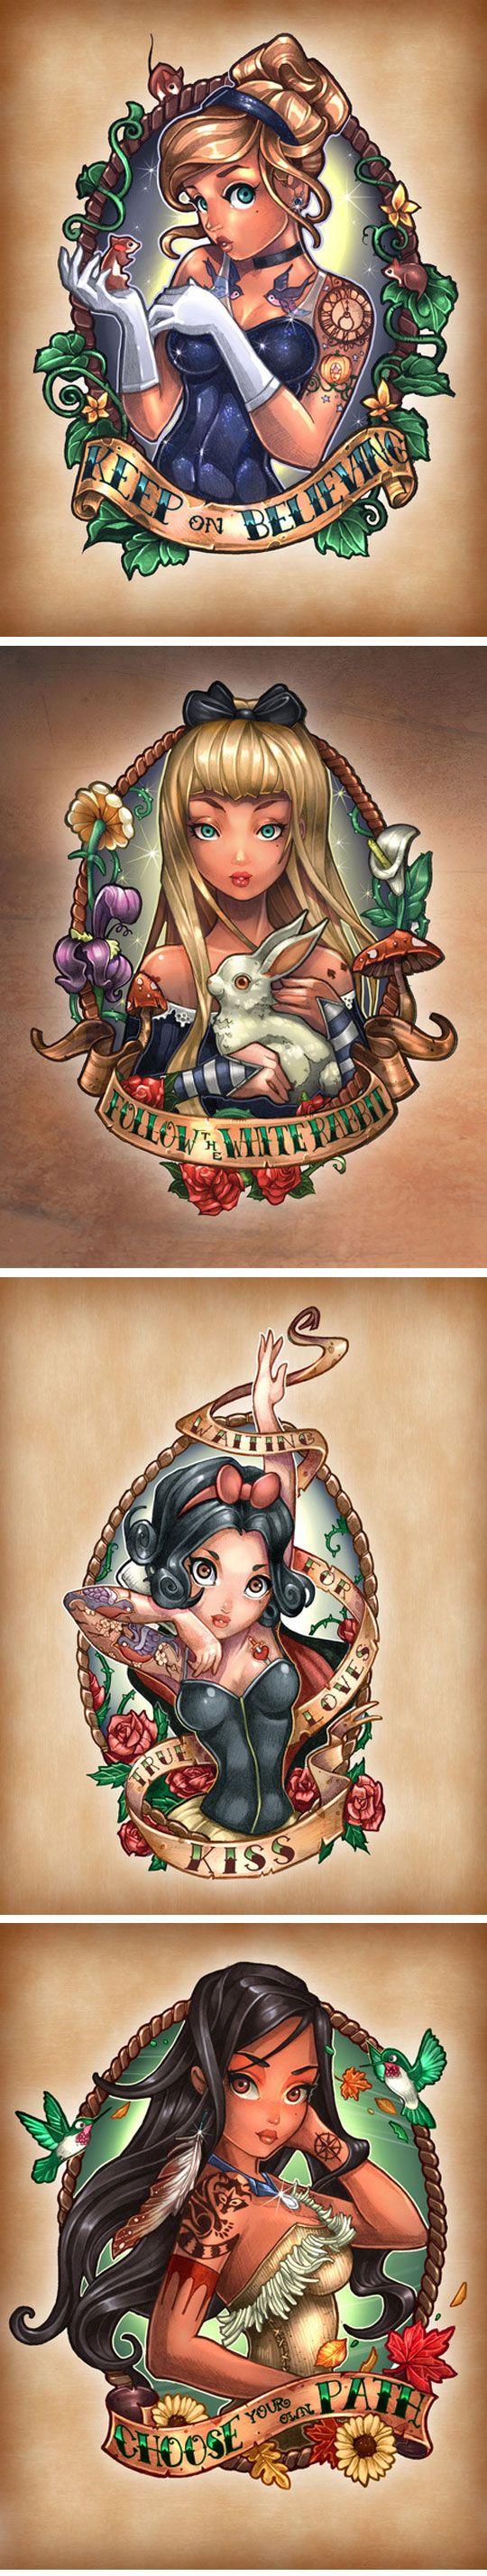 Disney Princesses As Vintage Pin-Up Tattoos